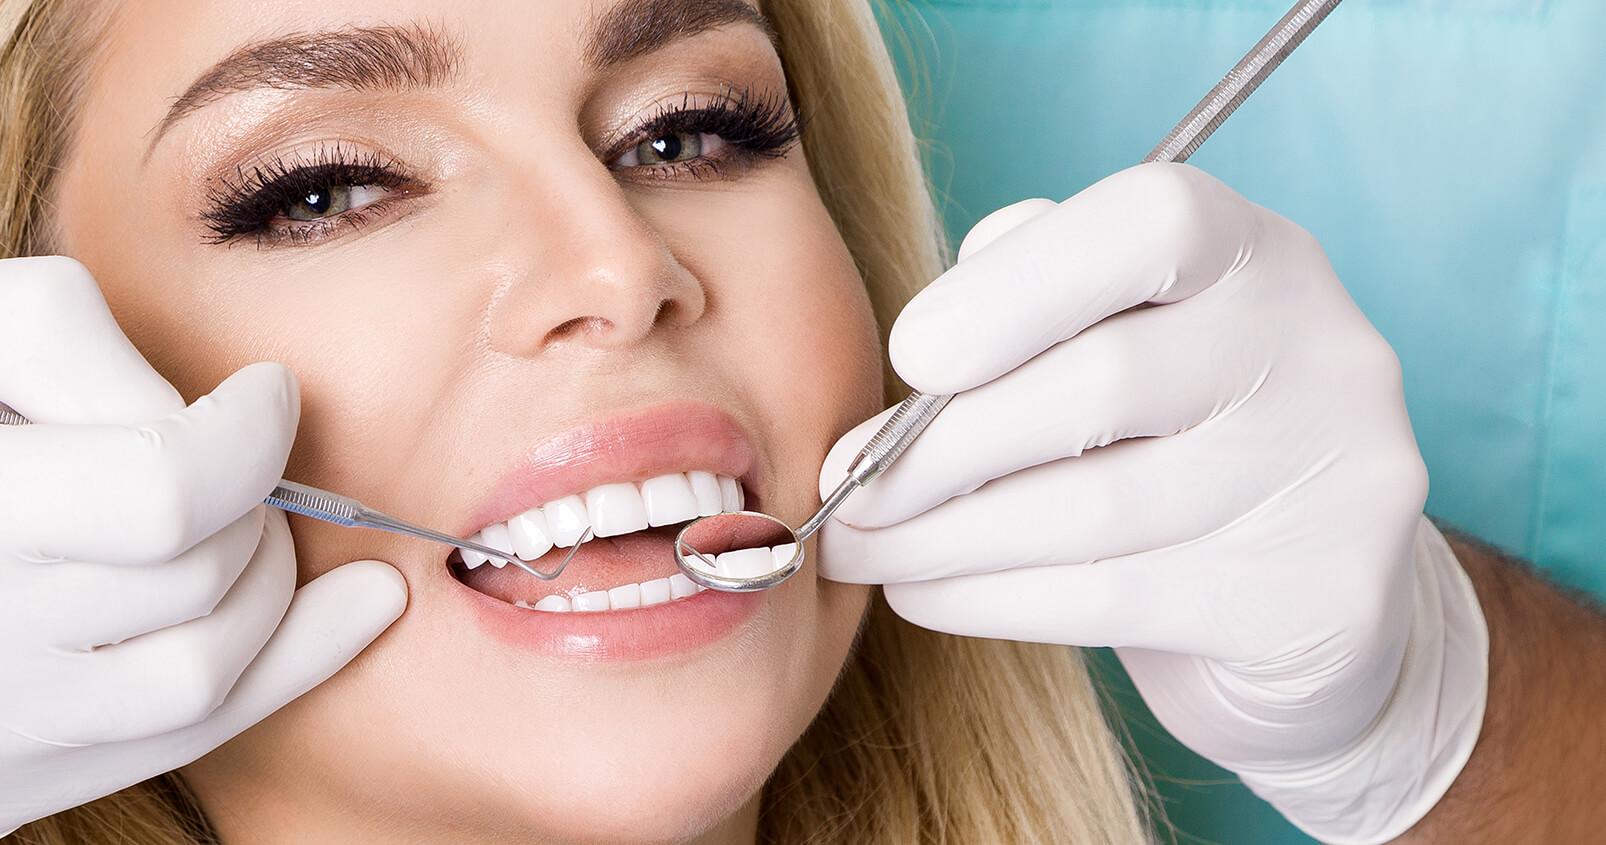 Upgrade your smile with porcelain teeth veneers Azusa, CA